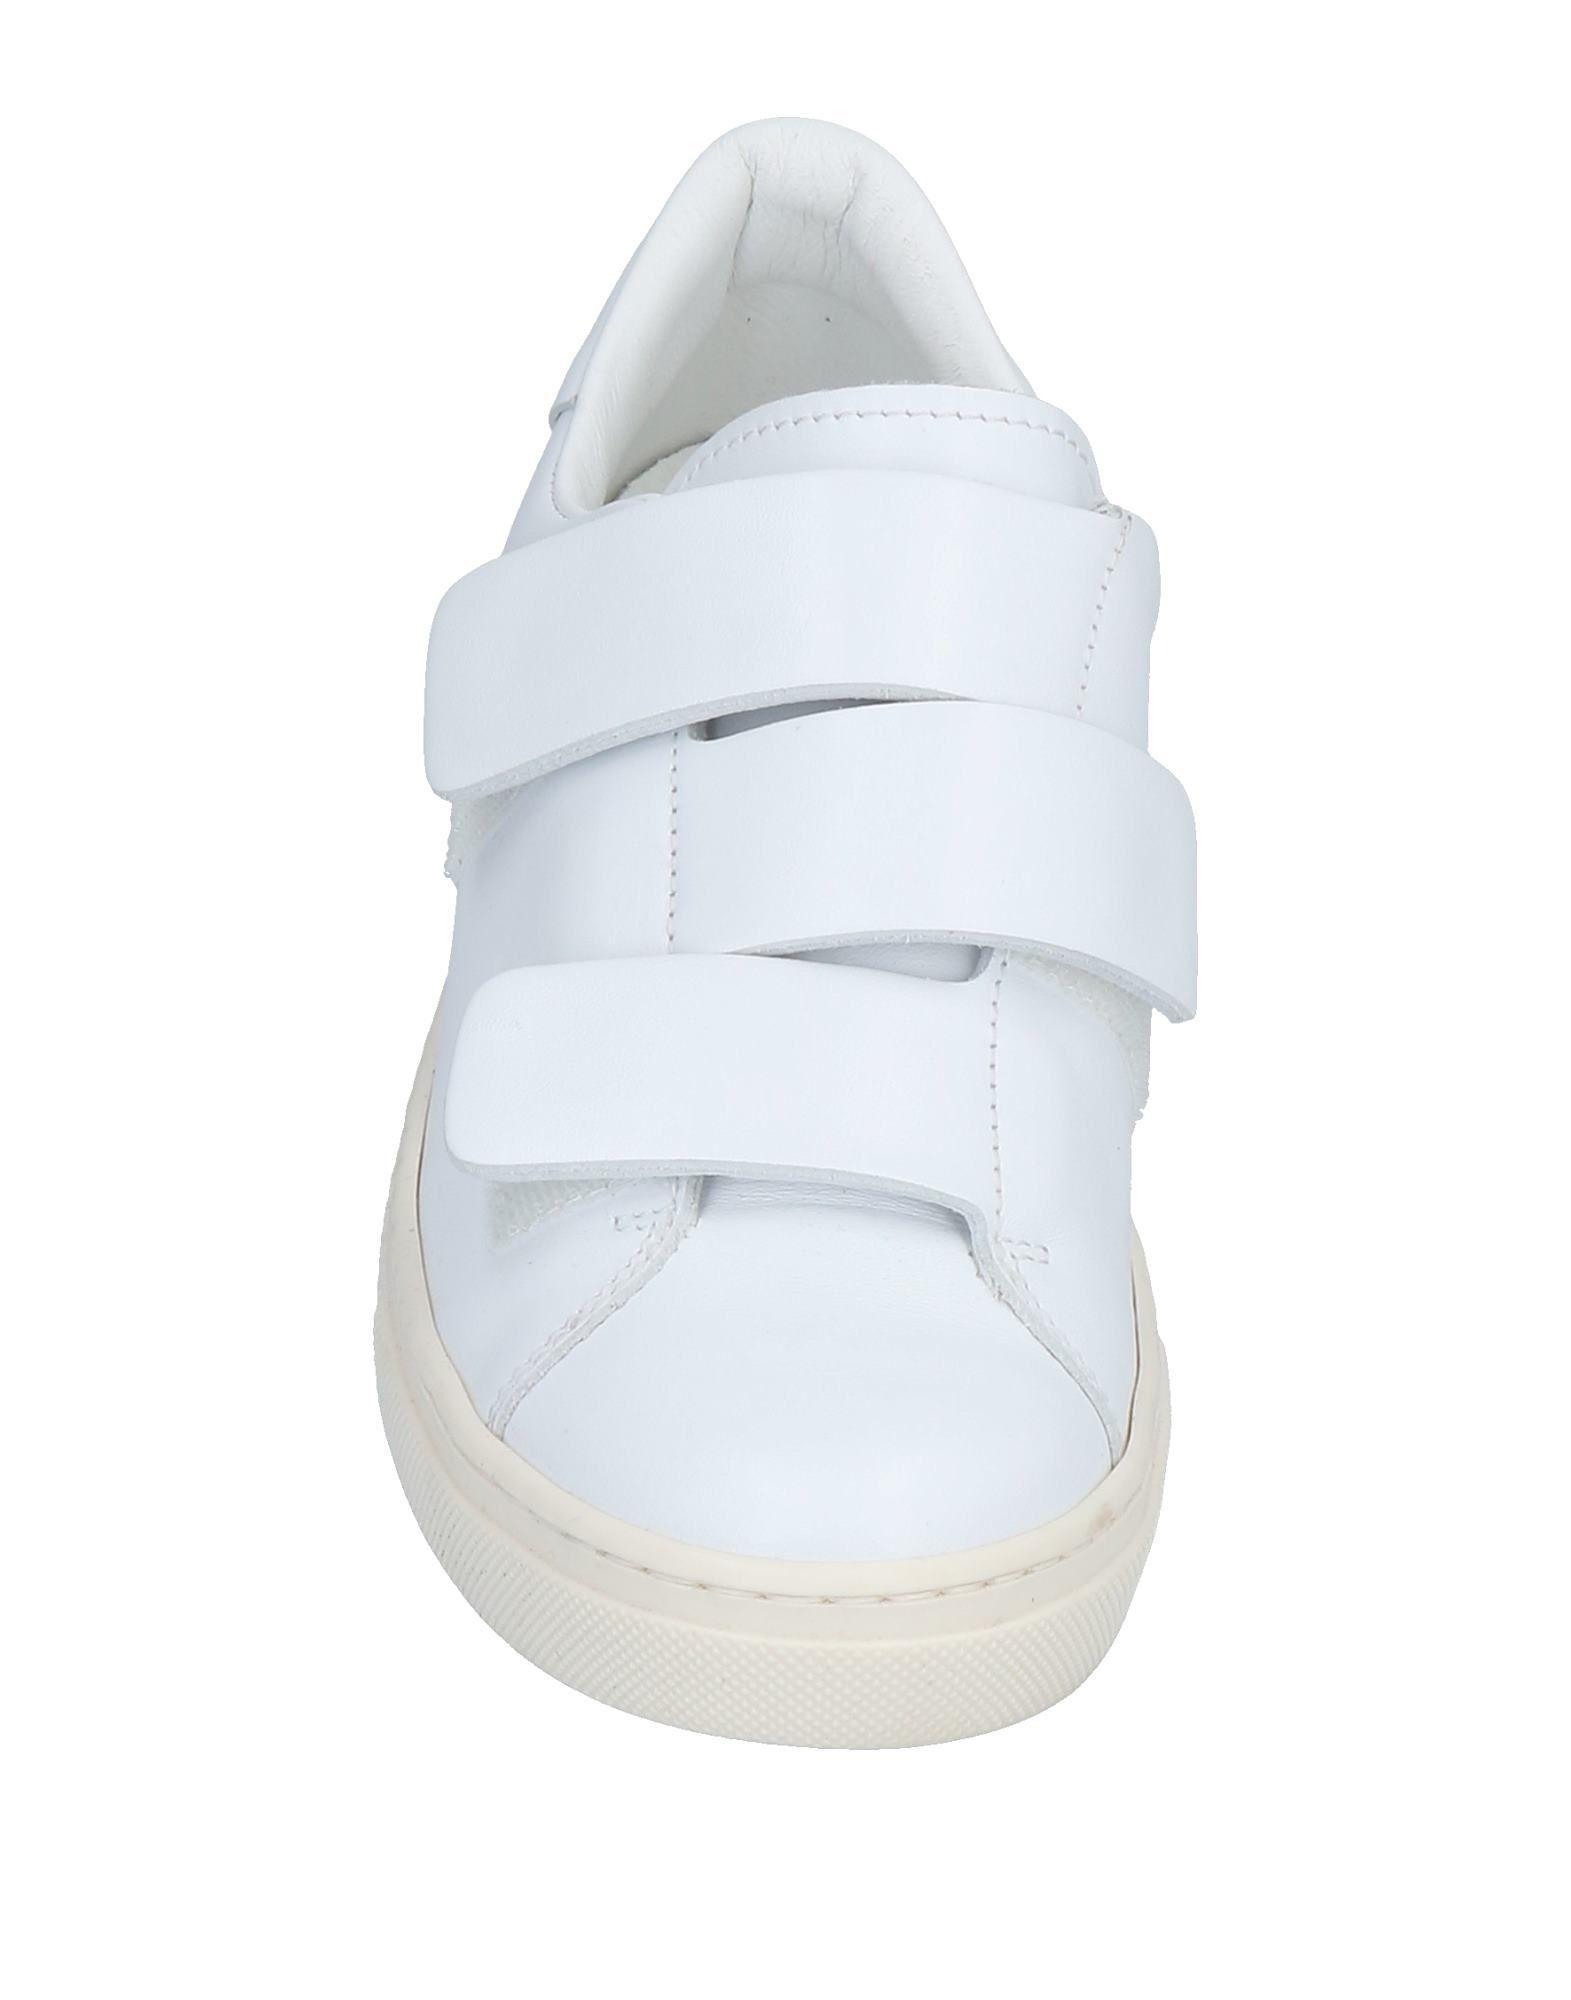 Sneakers & Tennis basses Cuir Lemarè en coloris Blanc qgnD